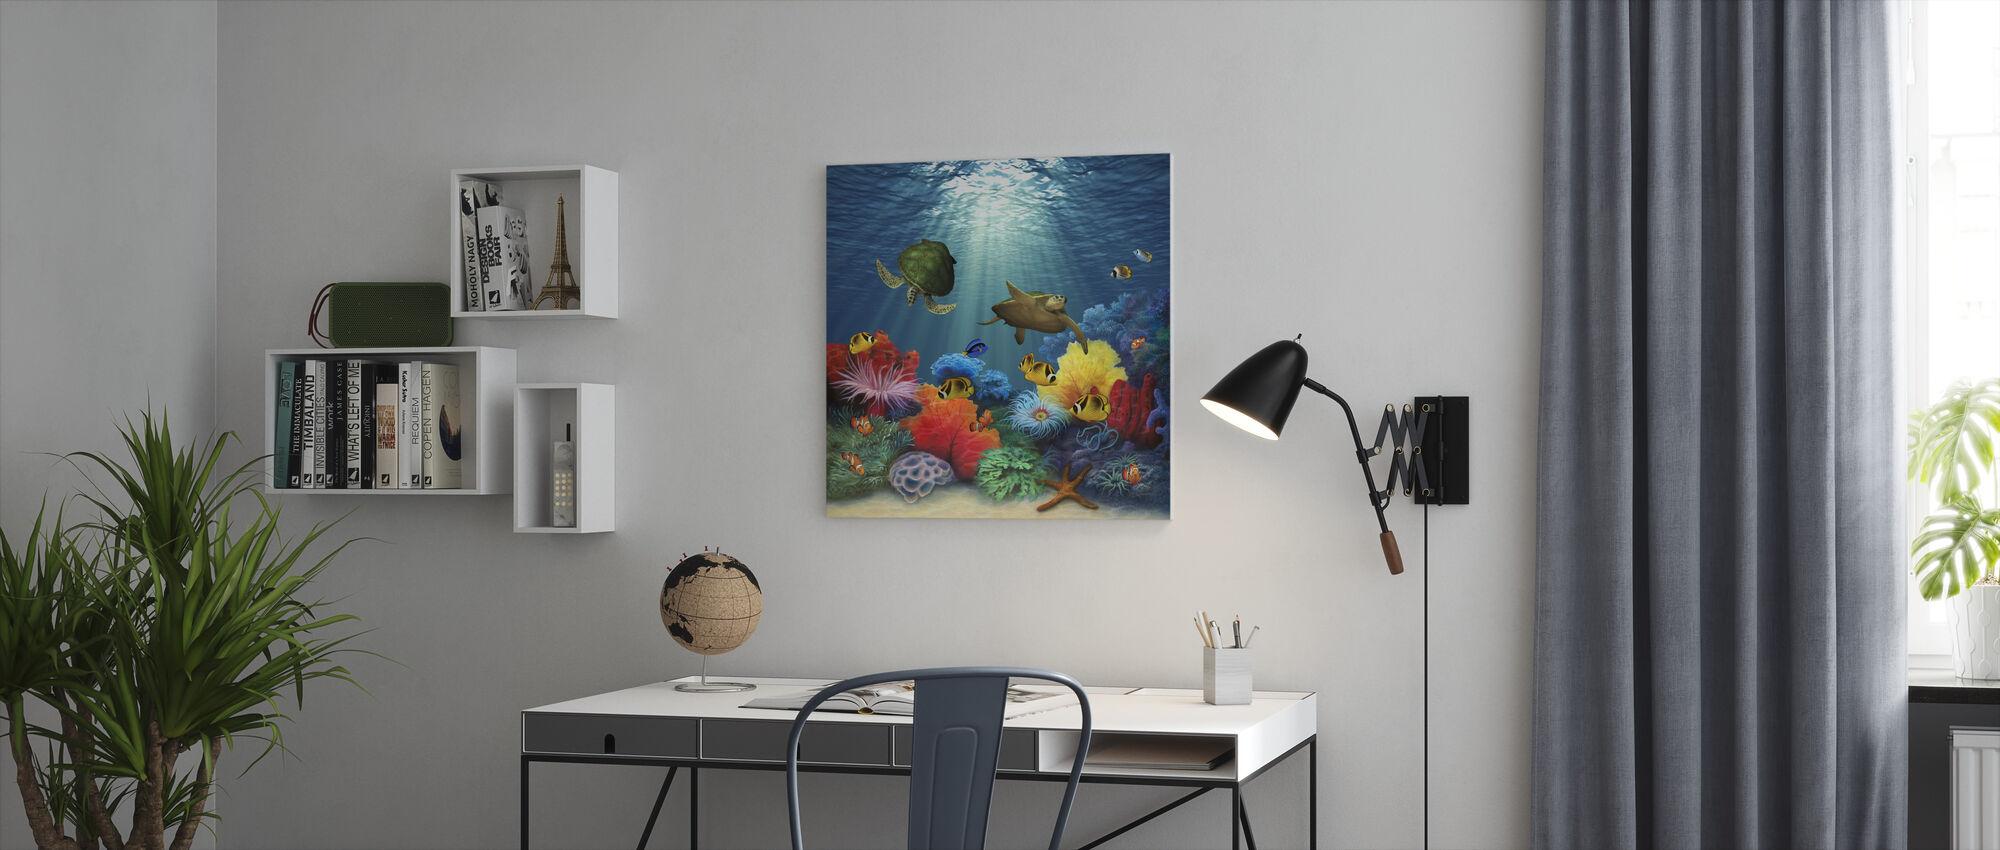 Korall Hav - Canvastavla - Kontor